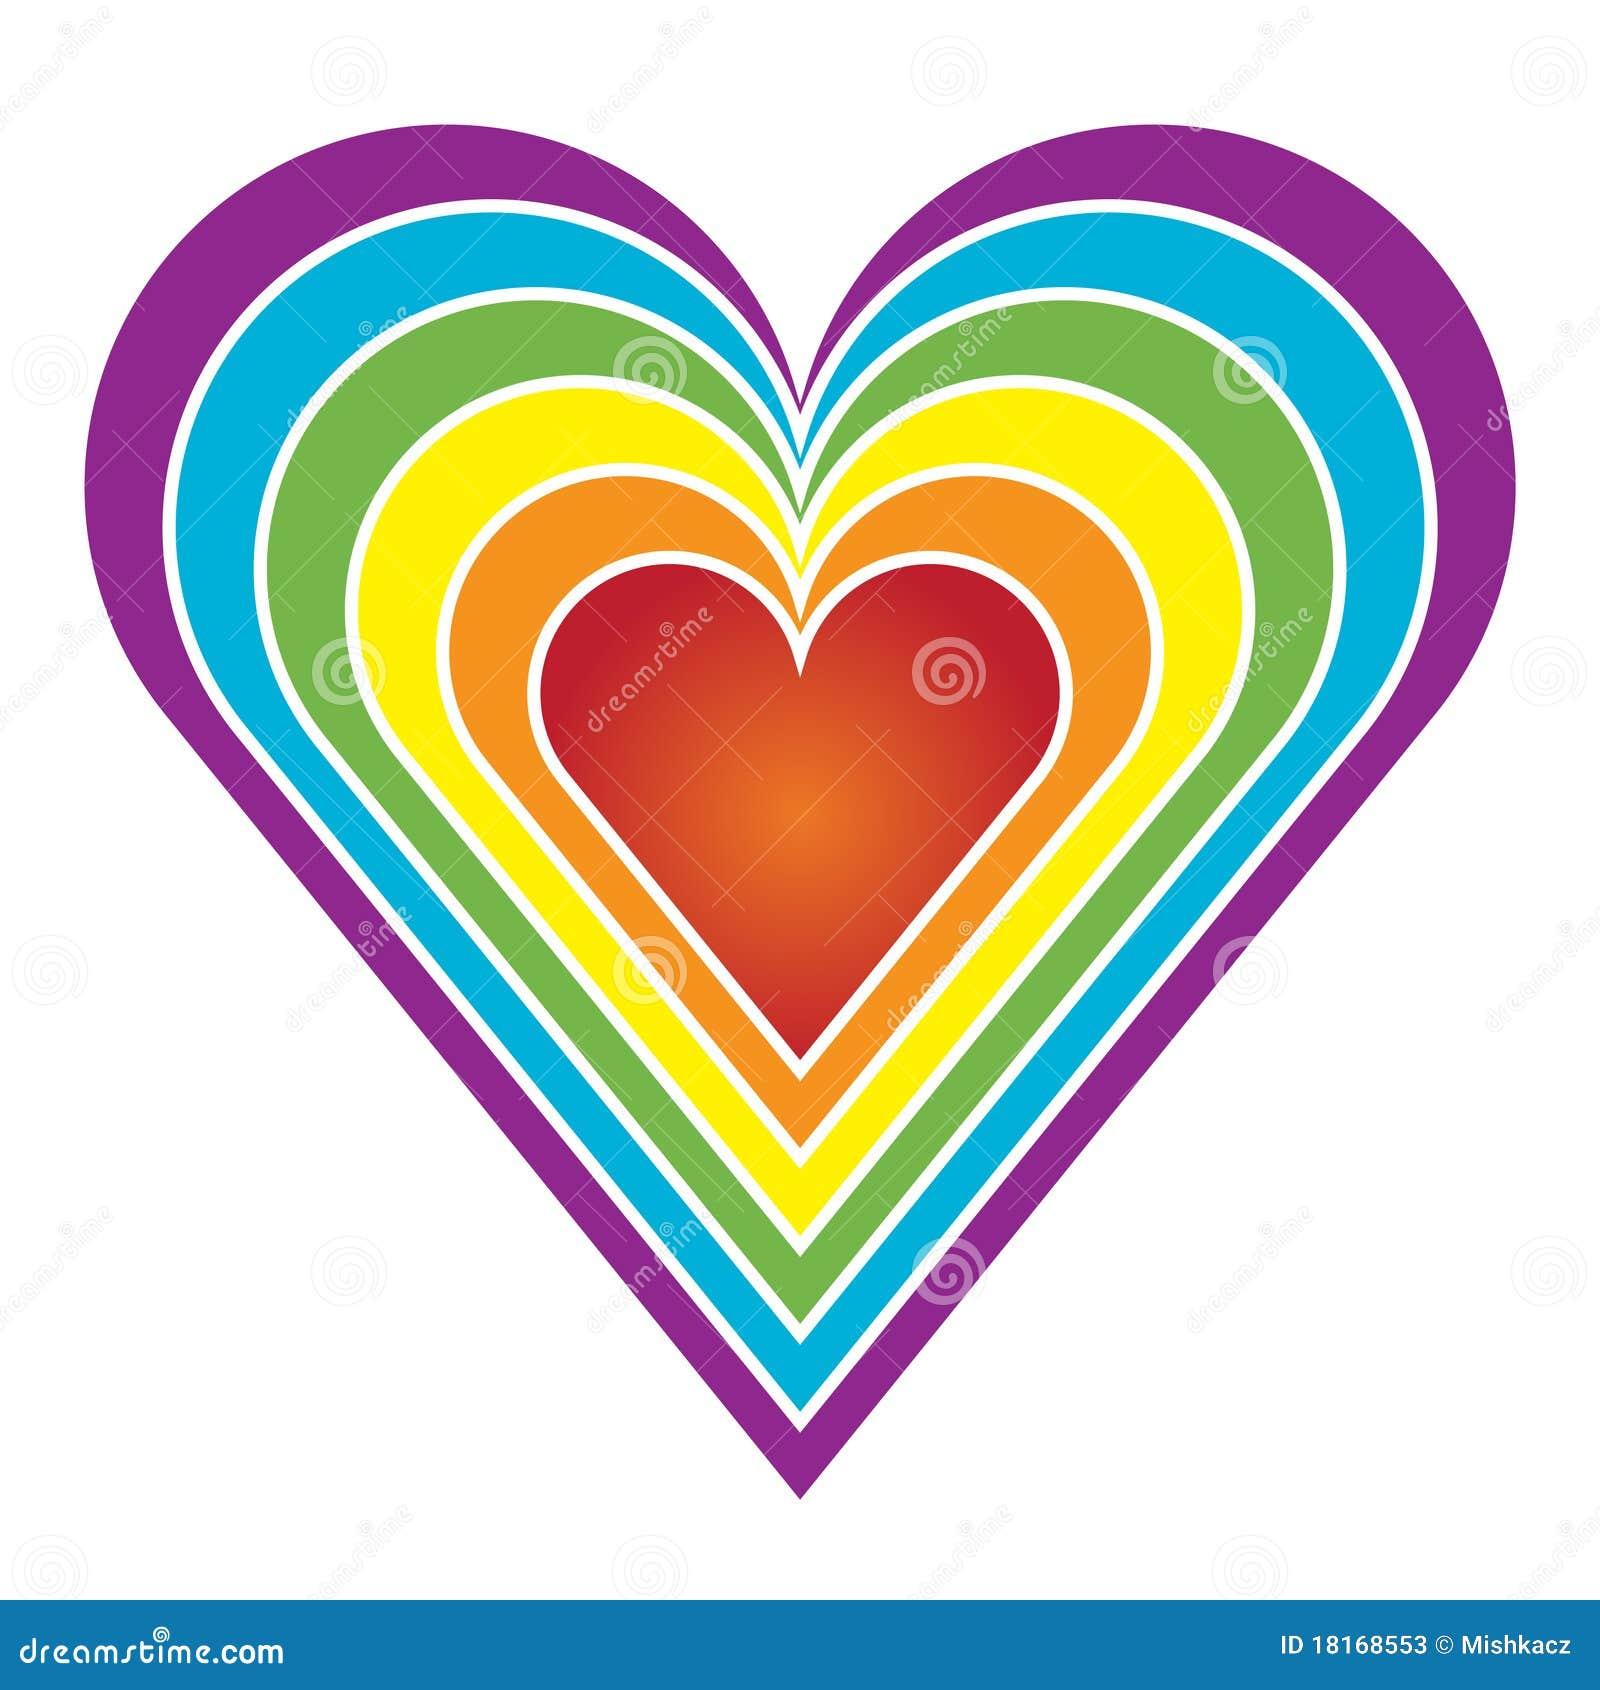 Gay dating city agoura hills